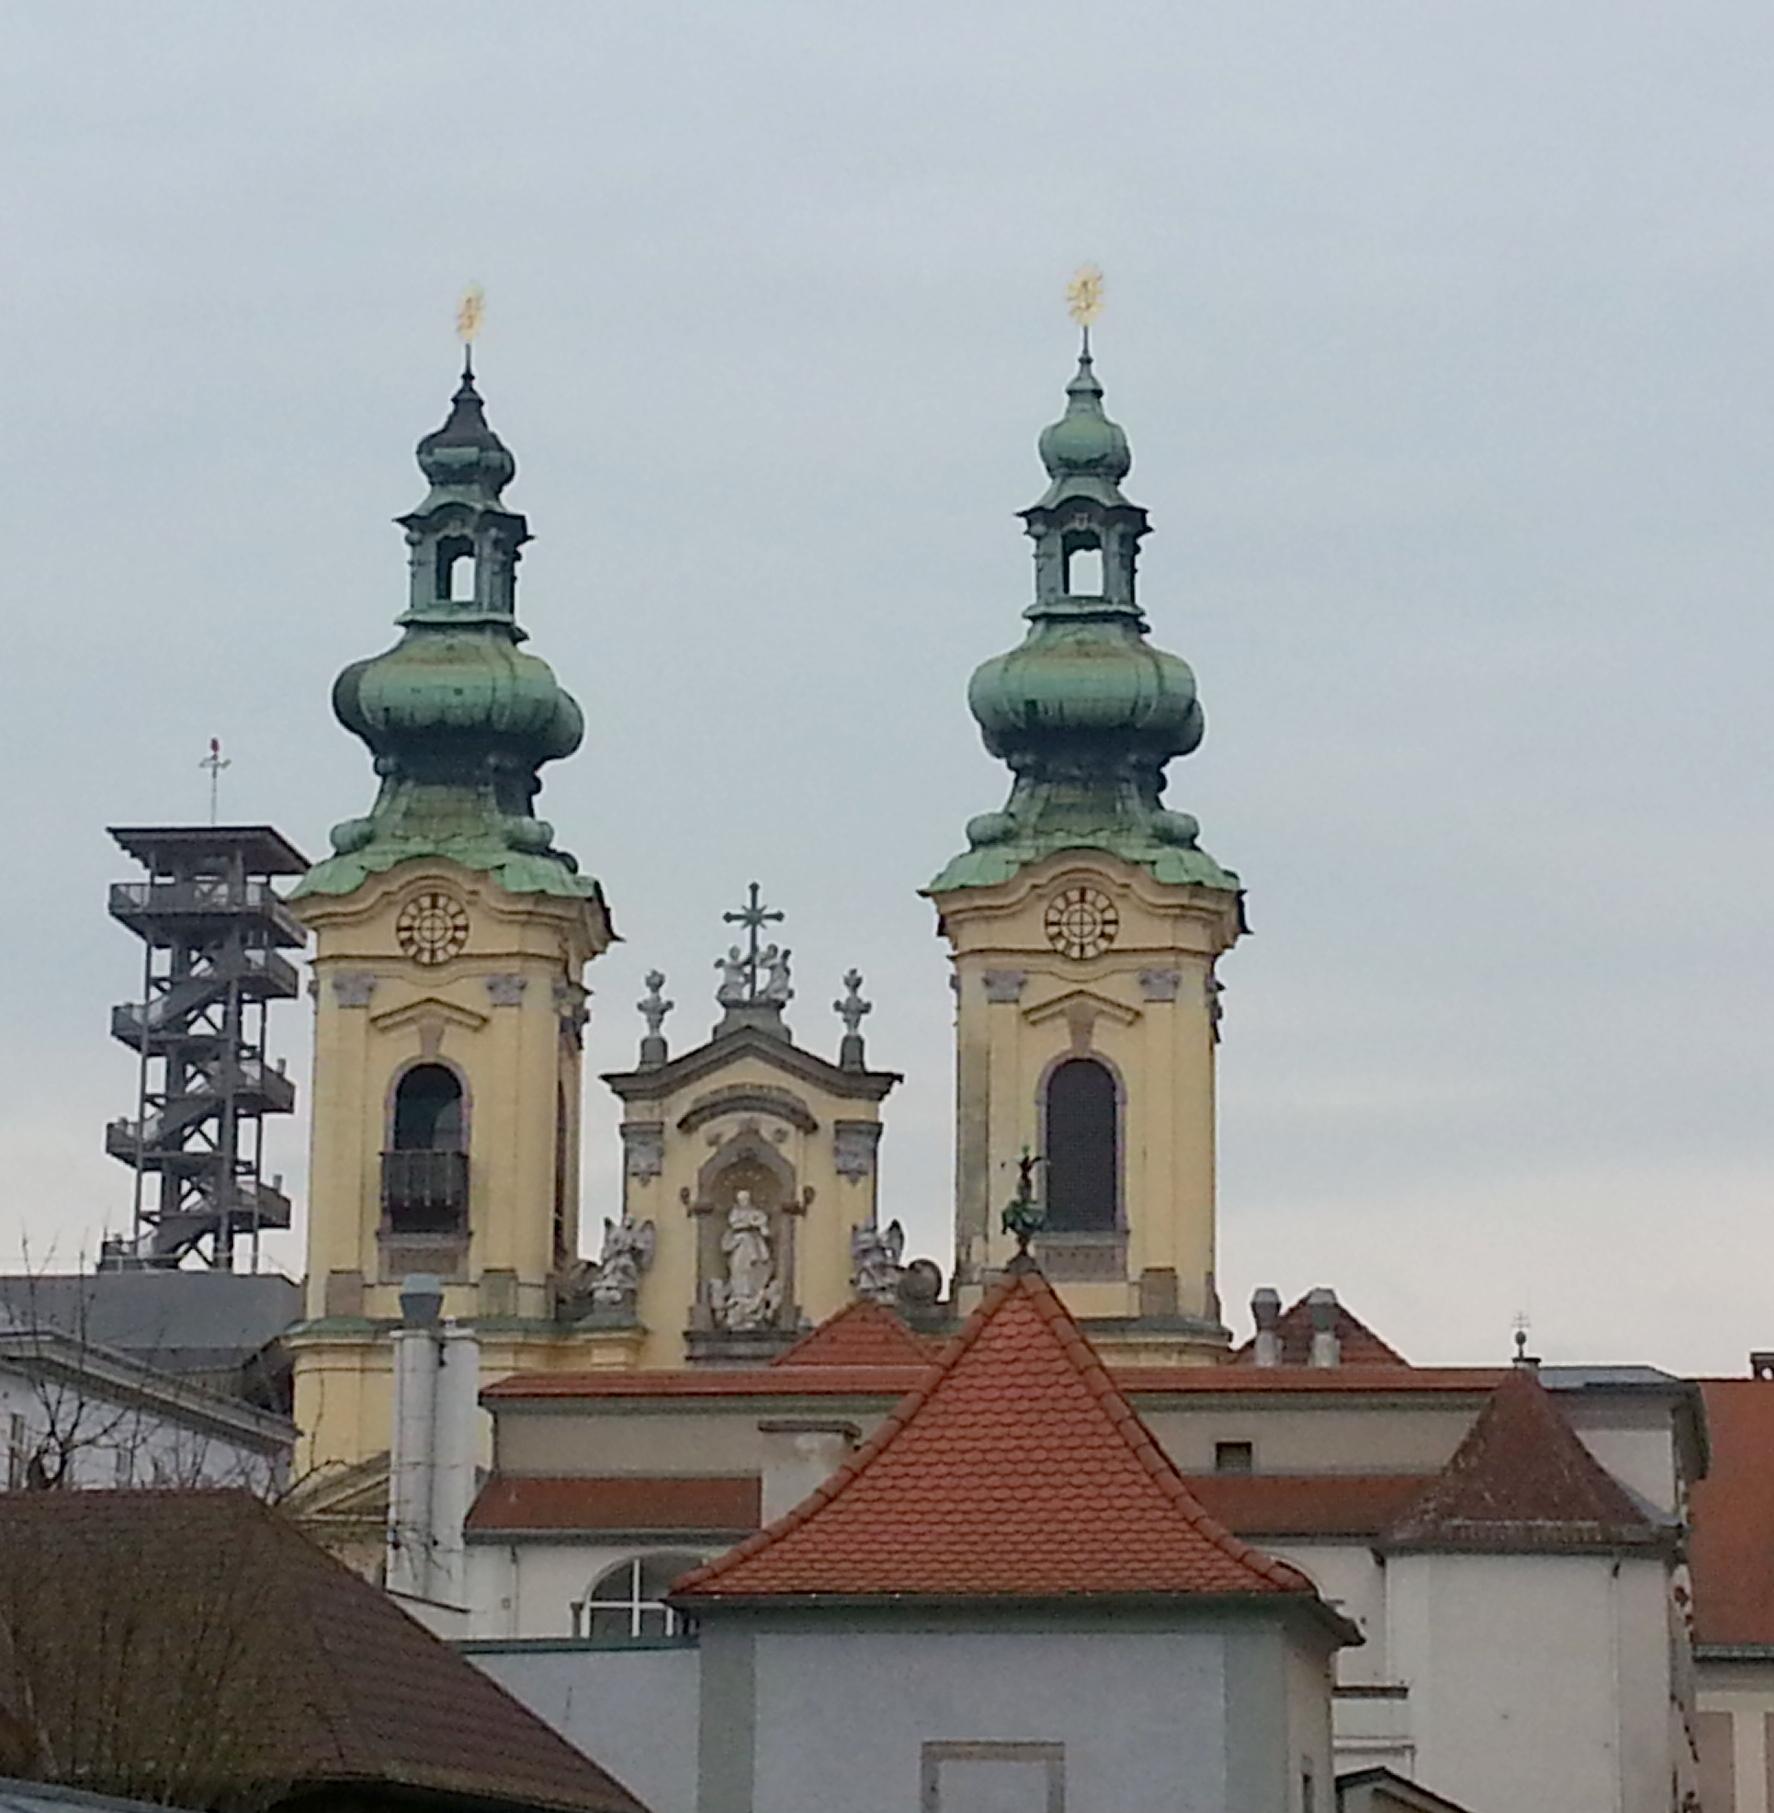 Linz: The Fun In Austria Continues! (Linz)